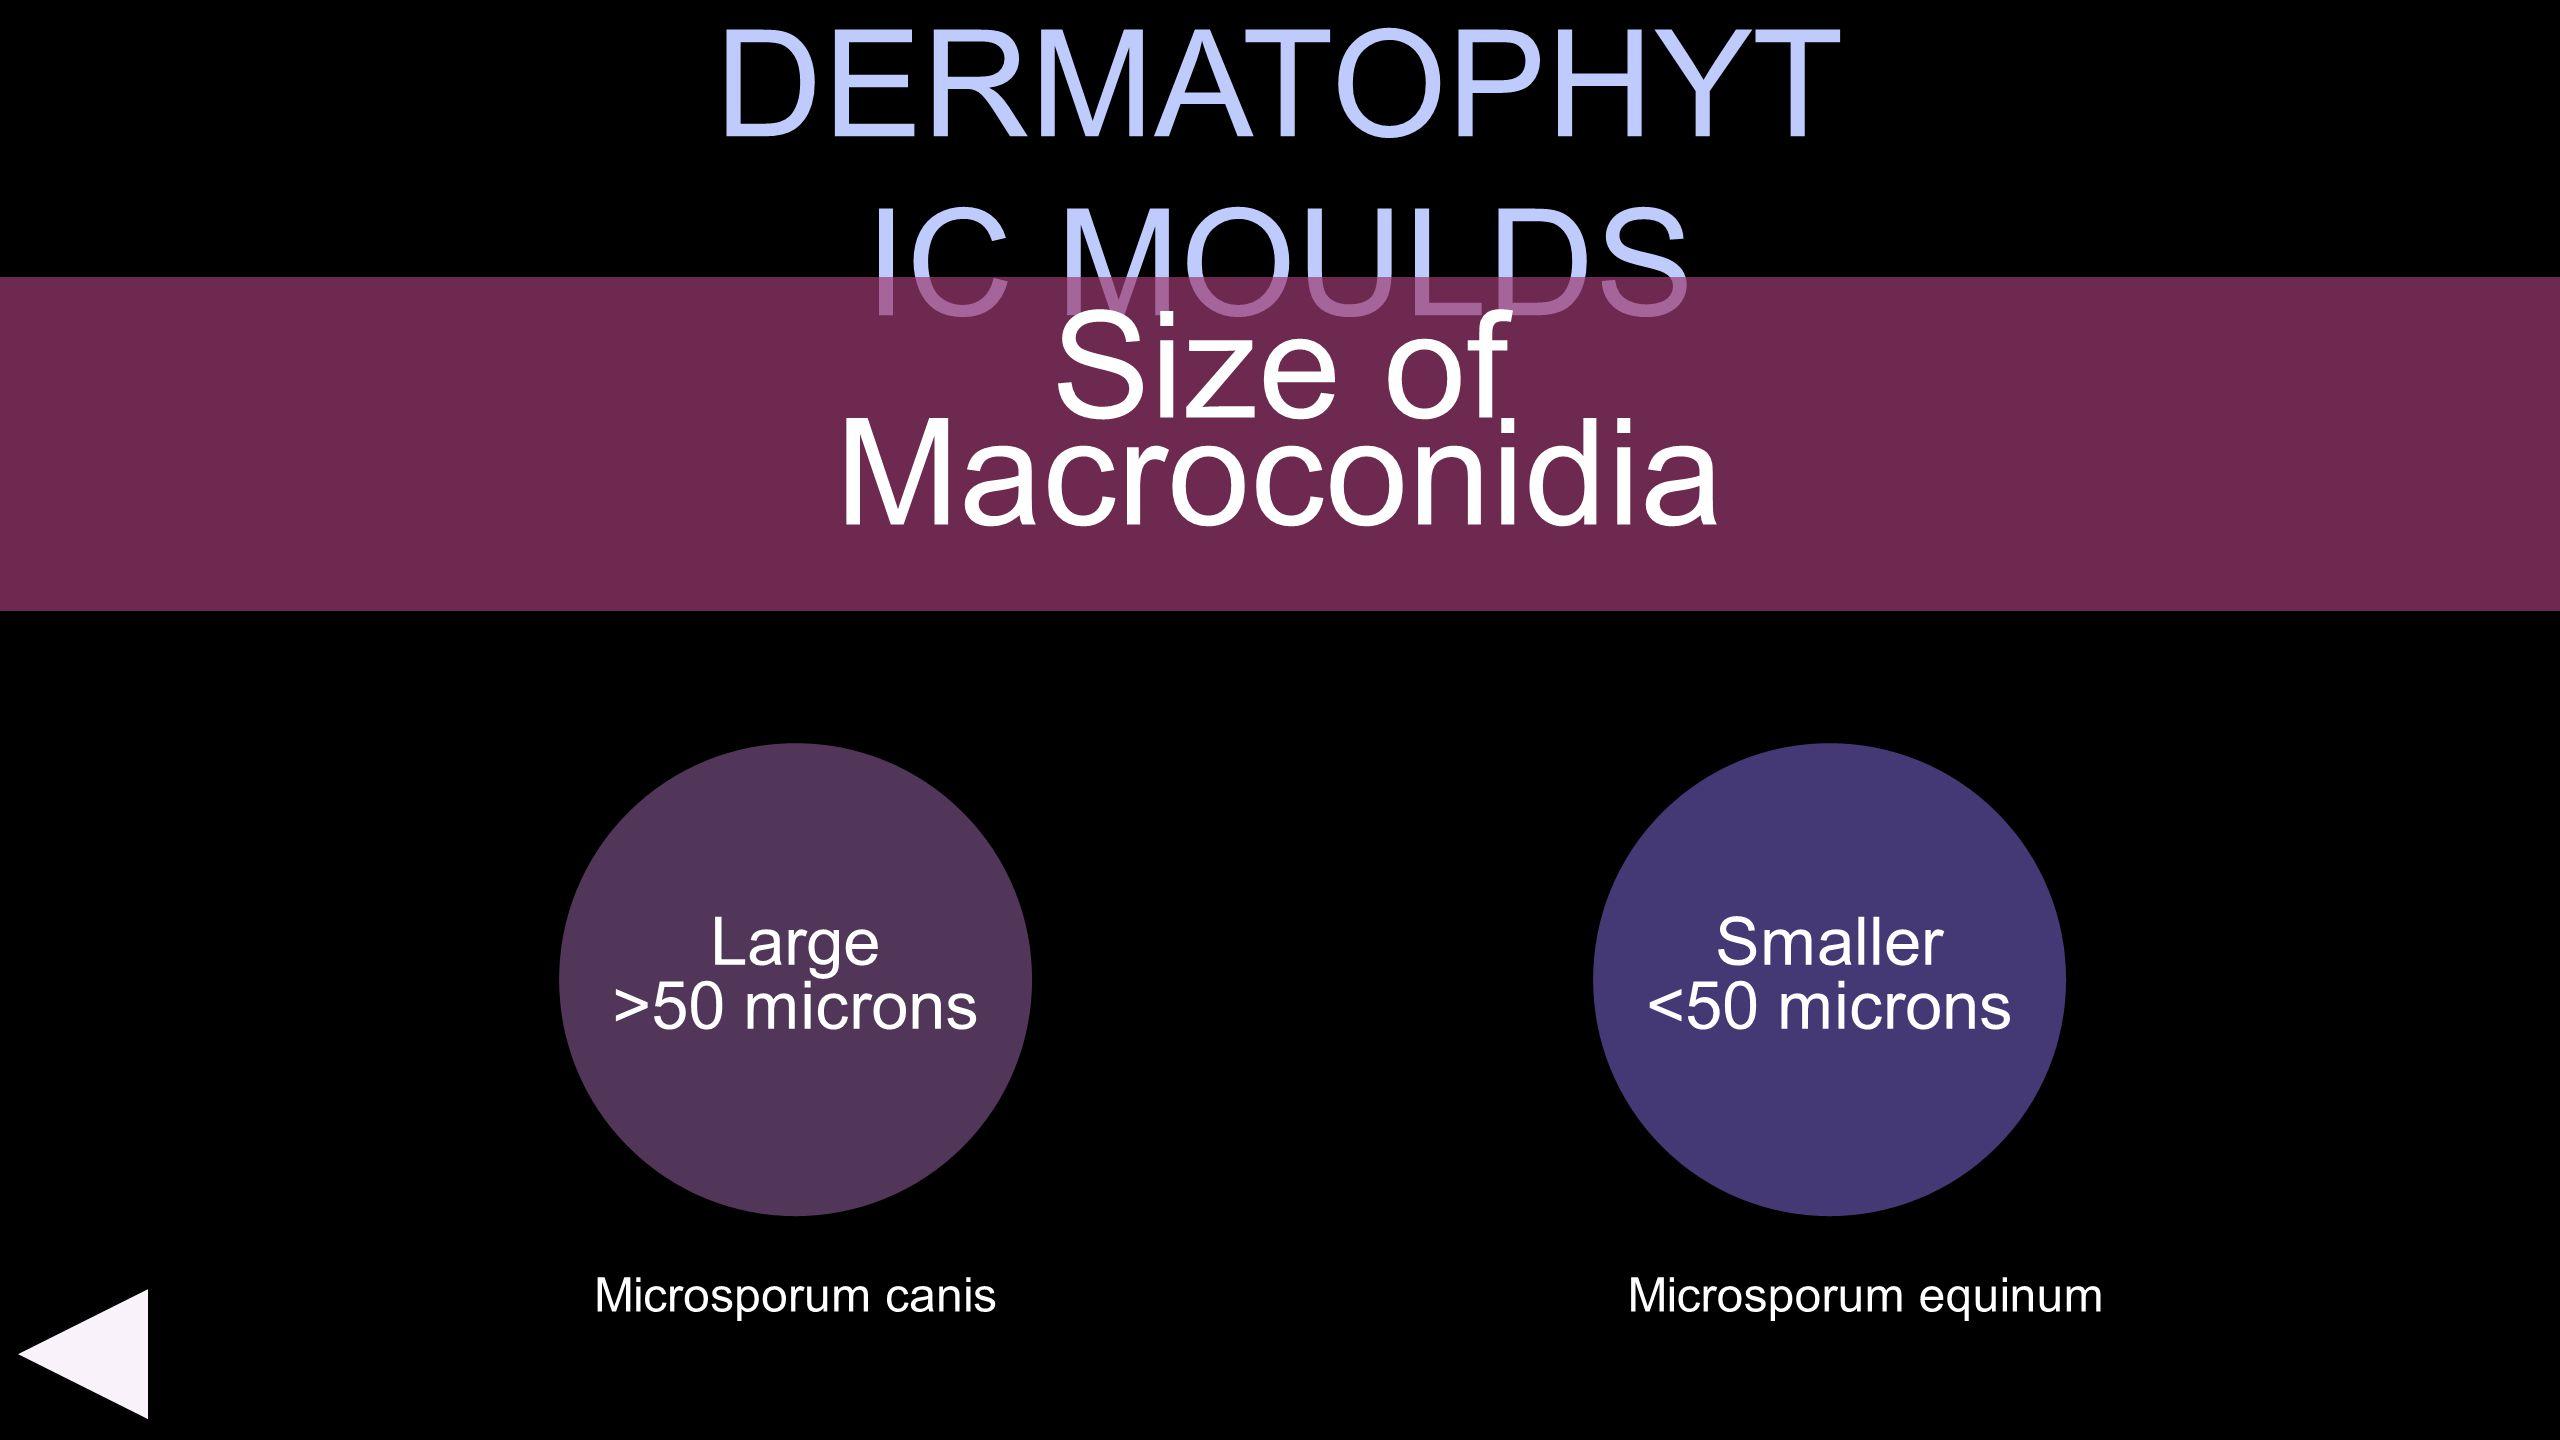 DERMATOPHYT IC MOULDS Large >50 microns Size of Macroconidia Smaller <50 microns Microsporum equinumMicrosporum canis